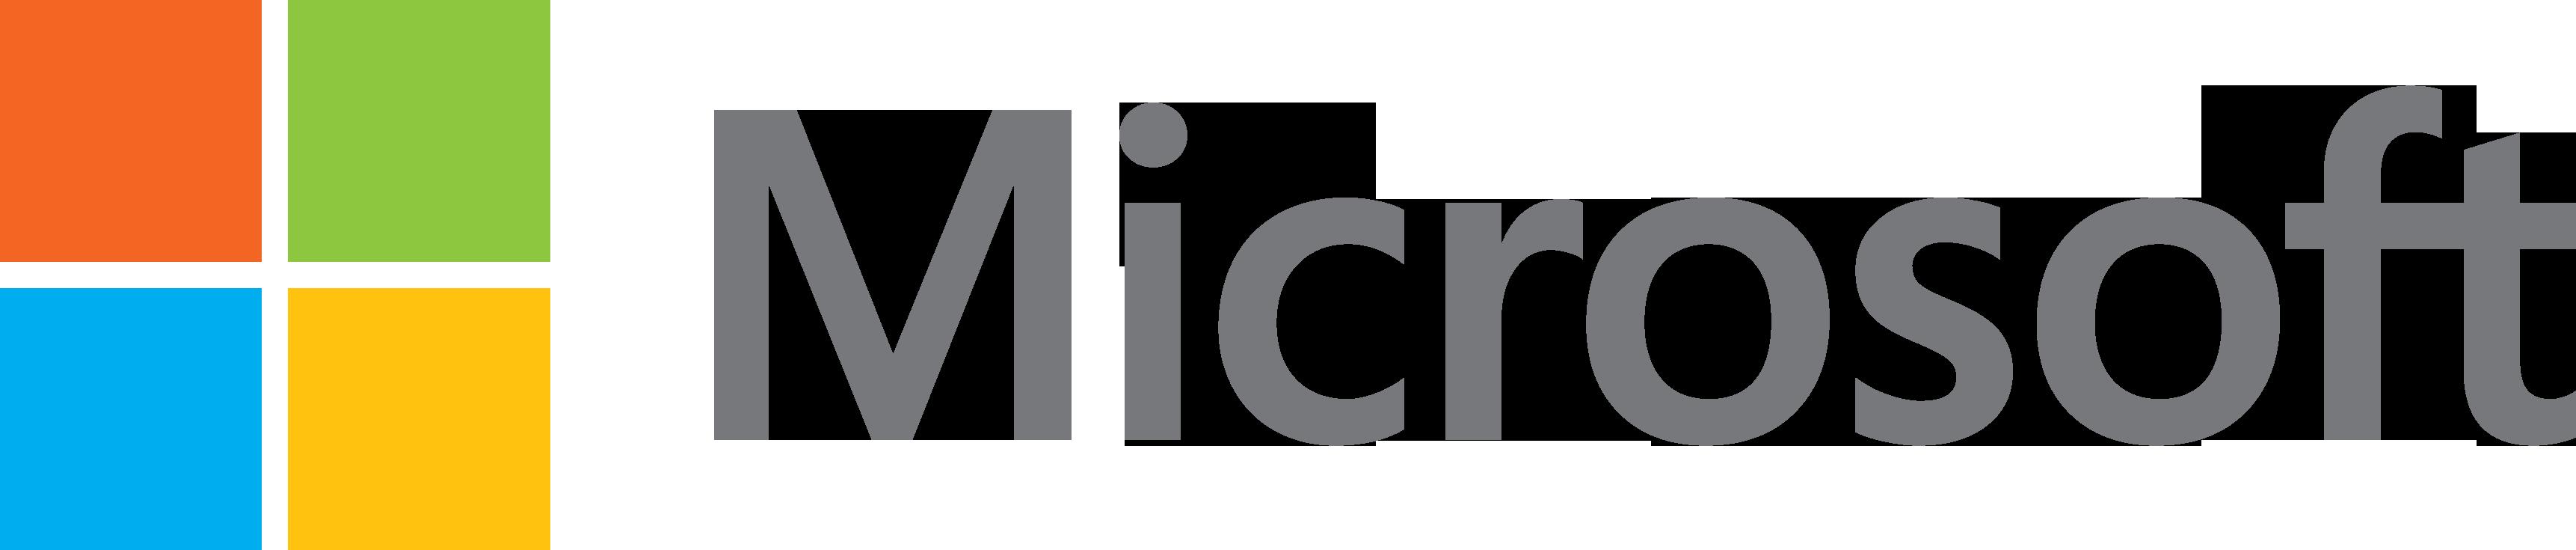 LogoMarca Microsoft